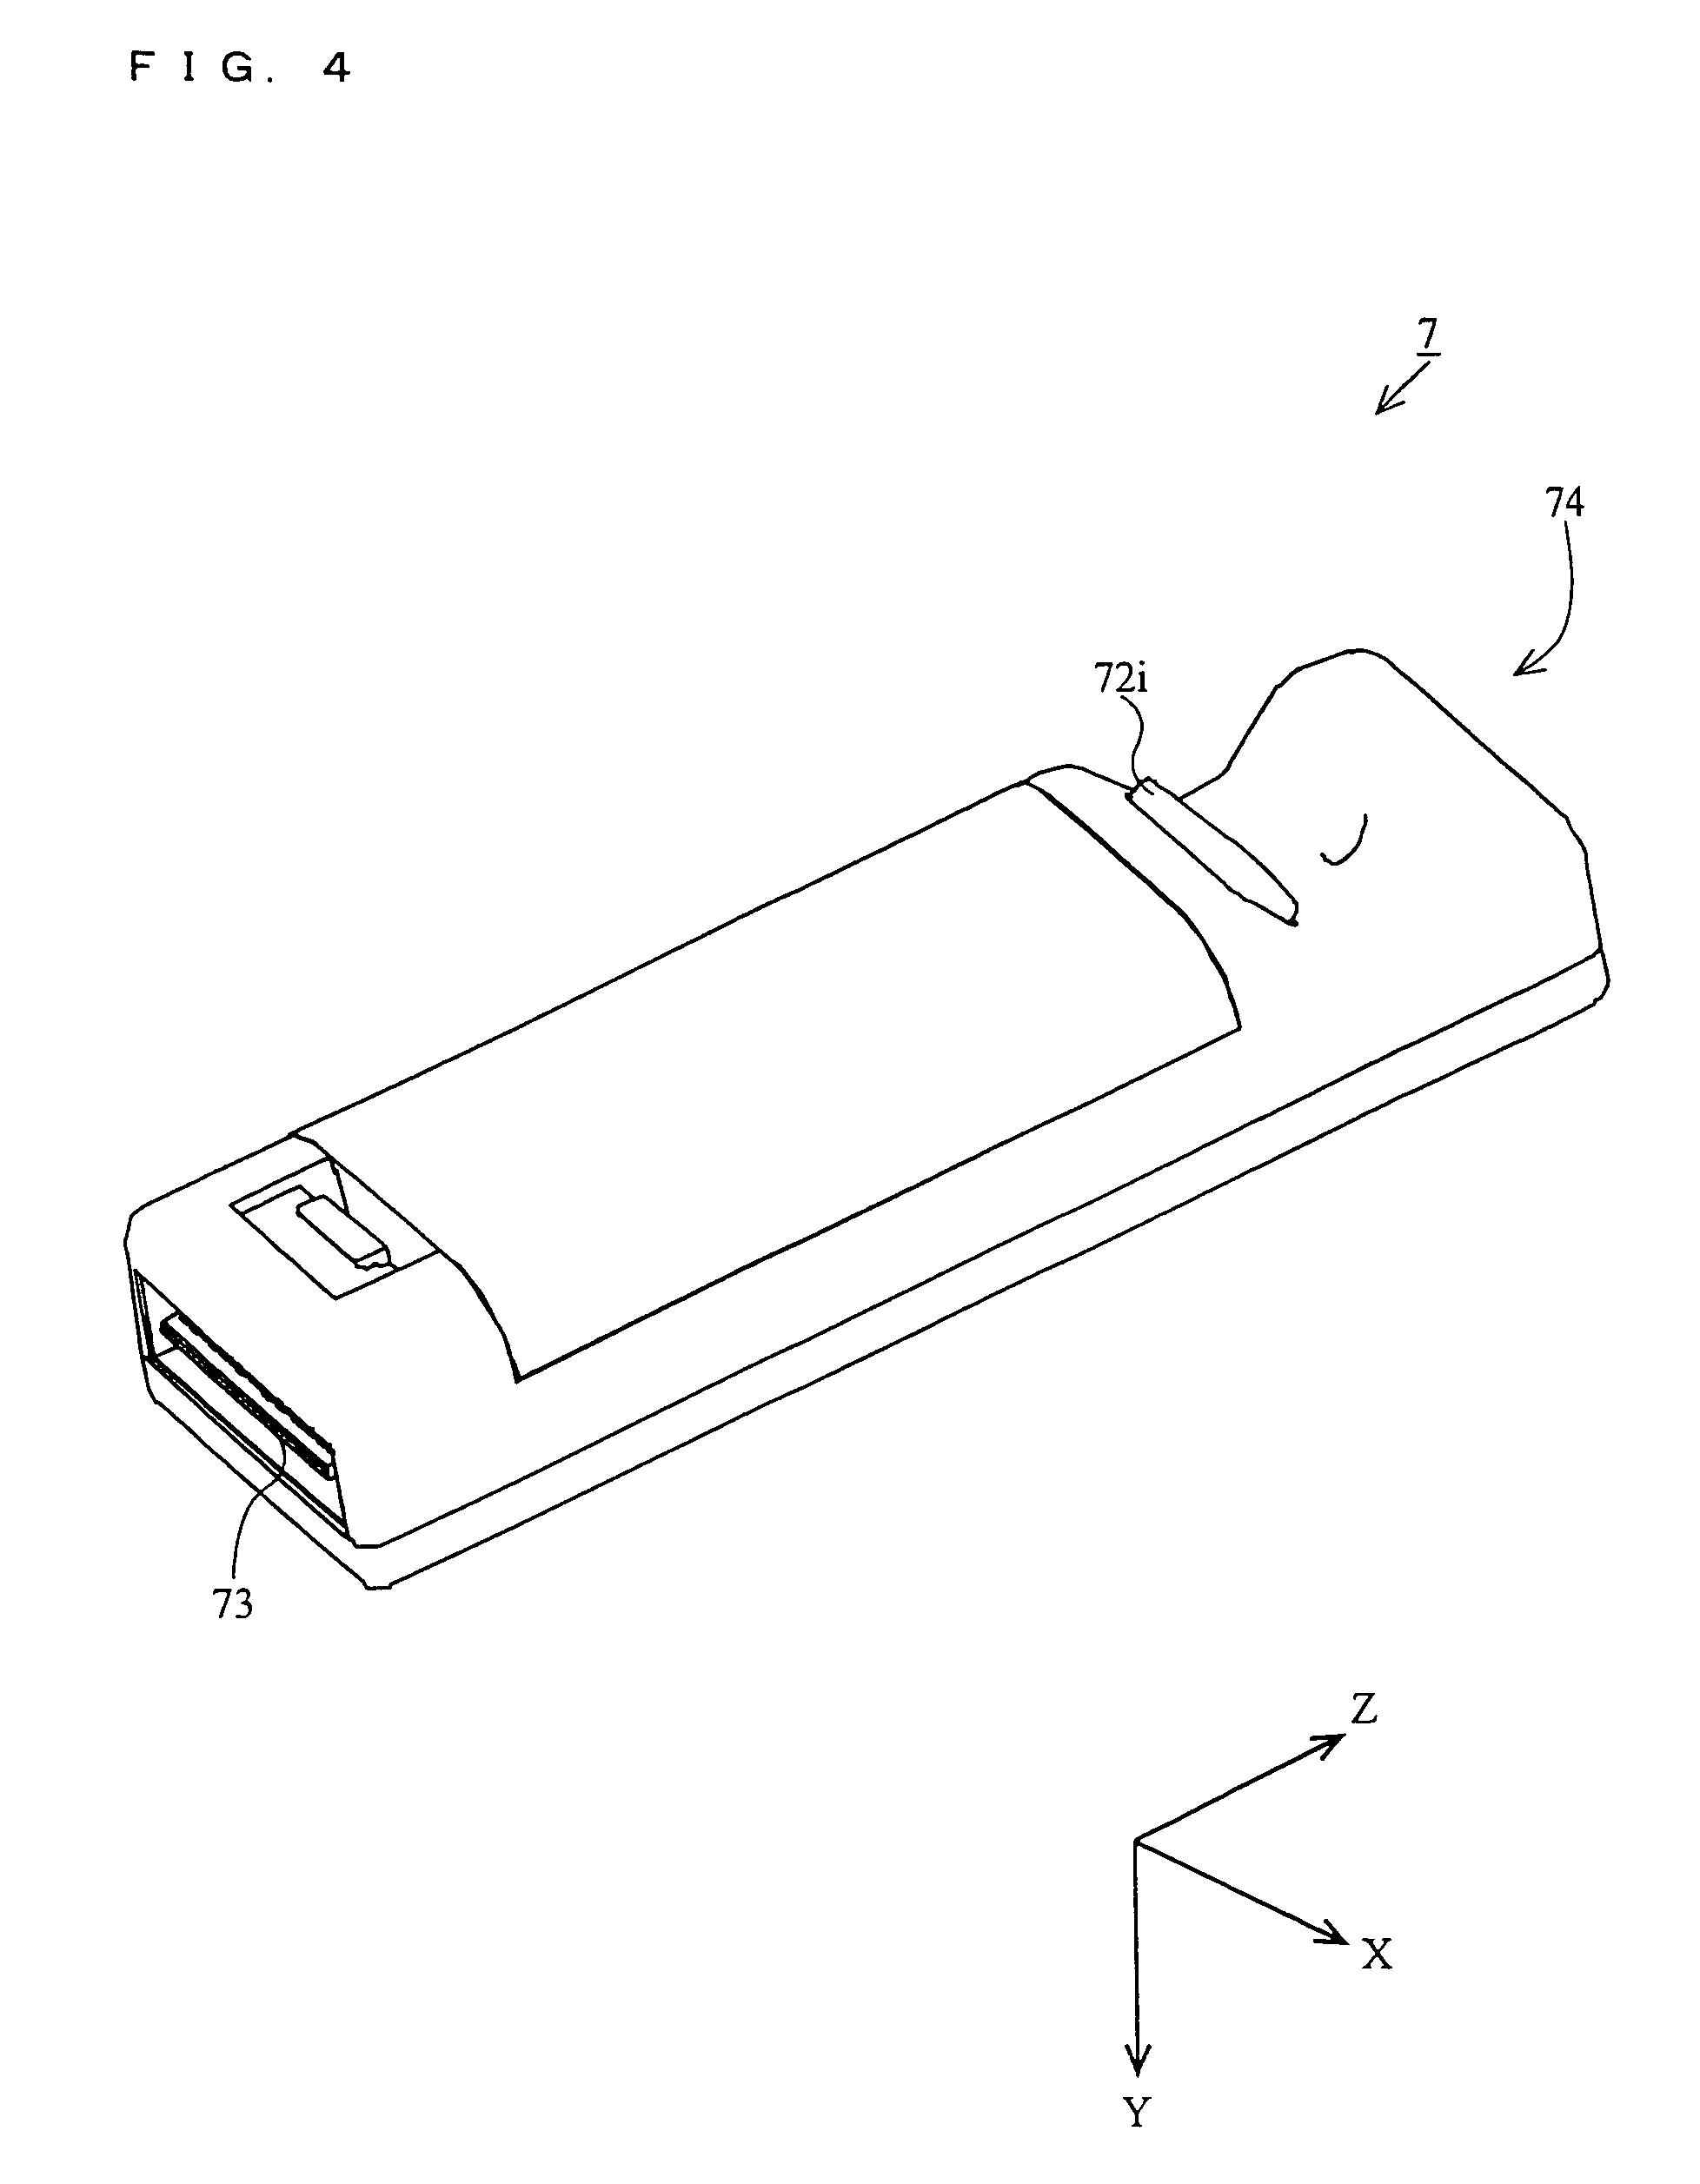 Patent US 7,774,155 B2